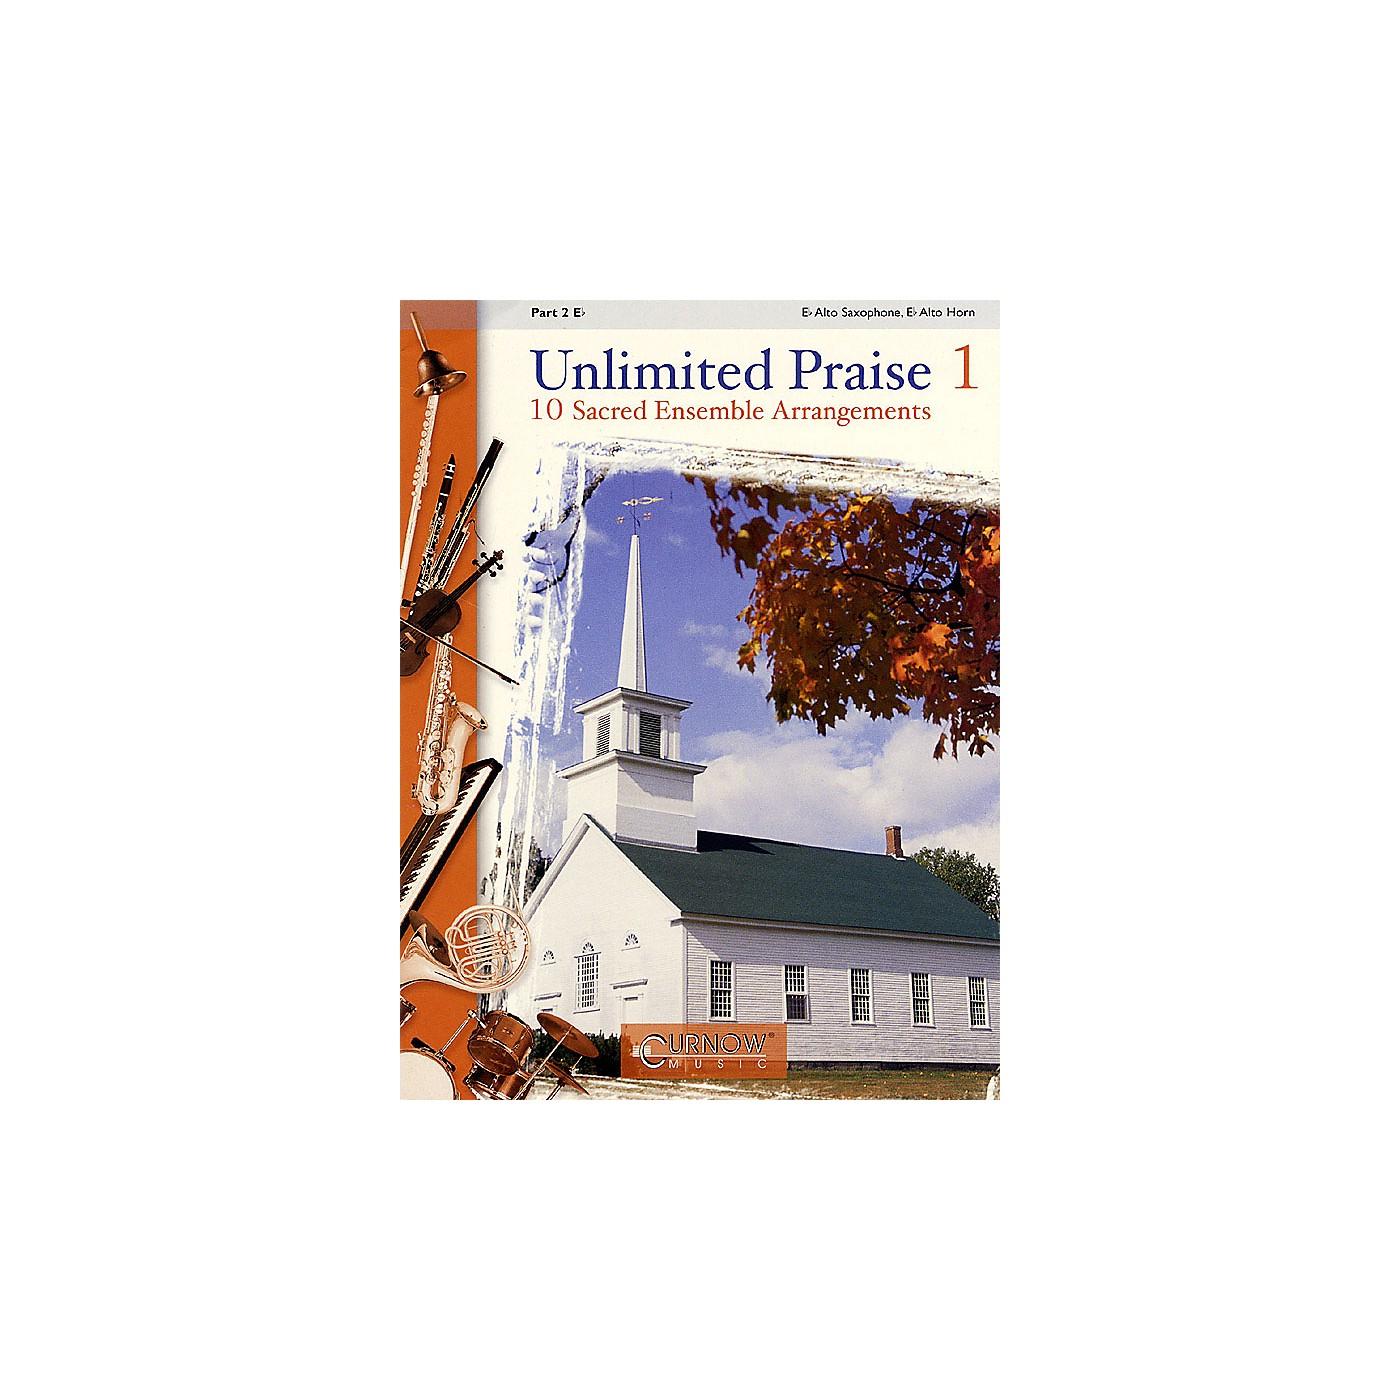 Curnow Music Unlimited Praise (Part 2 - Eb Instruments) Concert Band Level 2-4 thumbnail